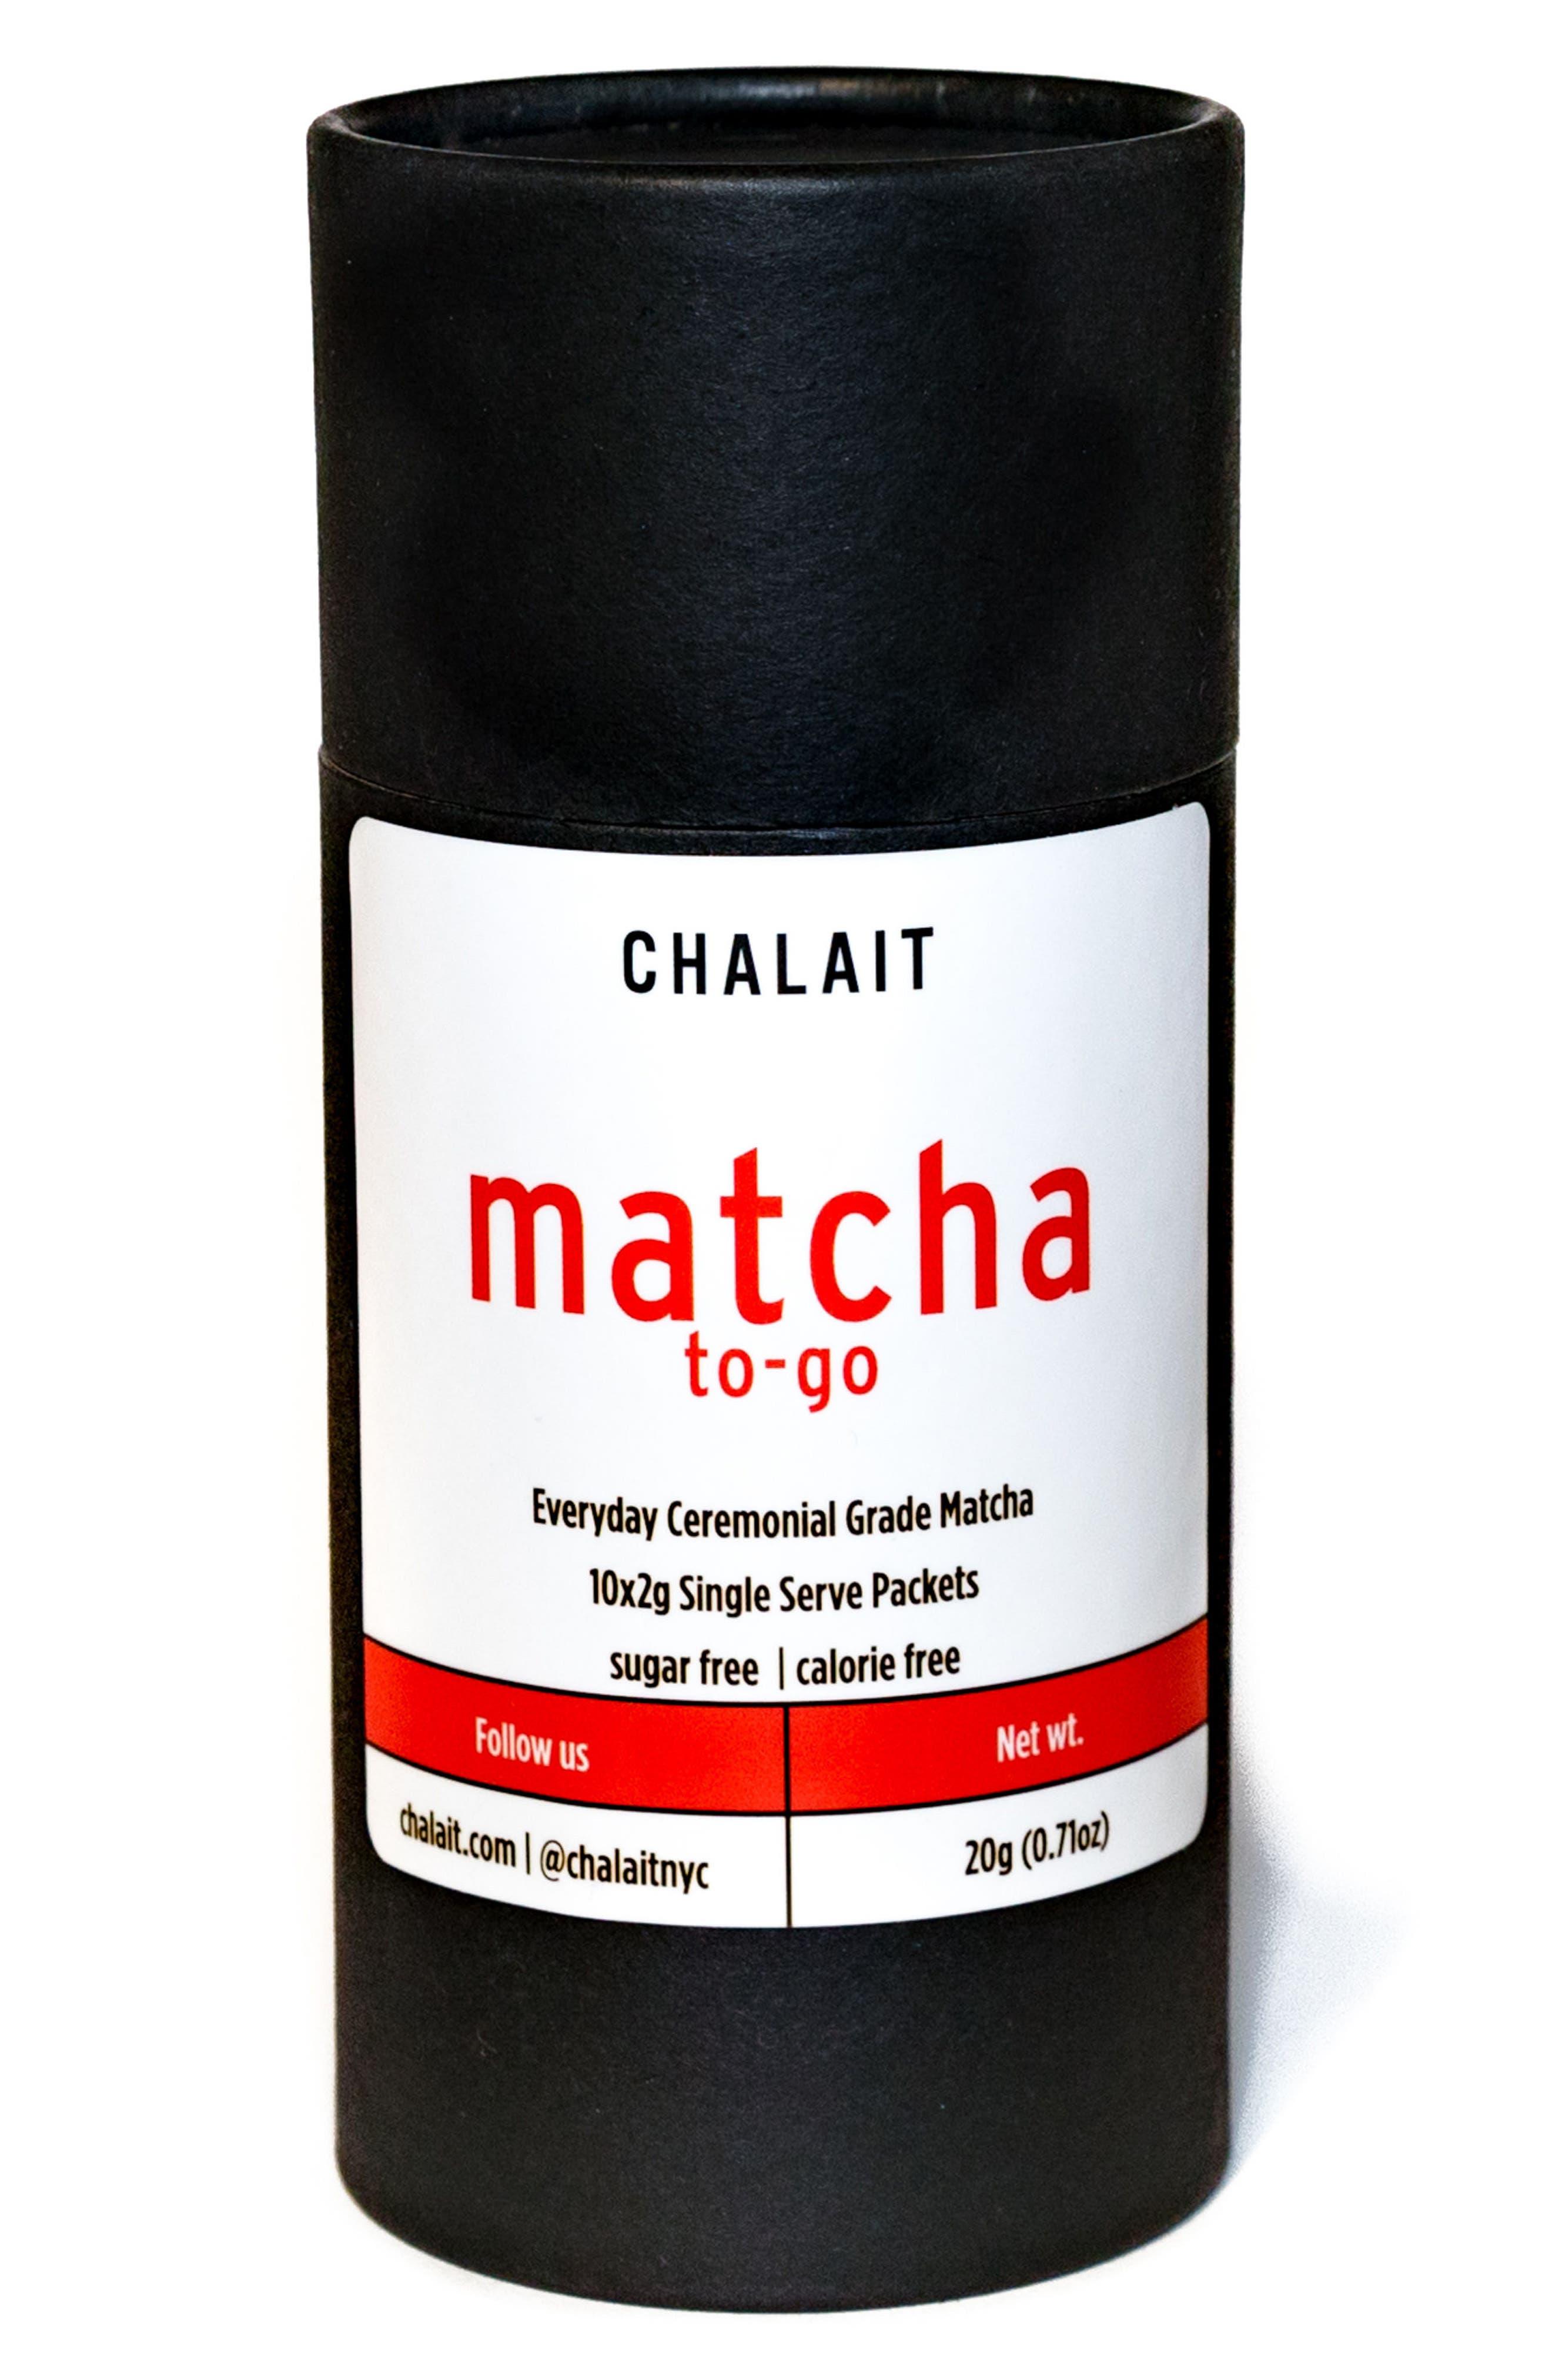 Chalait Ceremonial Everyday Matcha To-Go Sticks